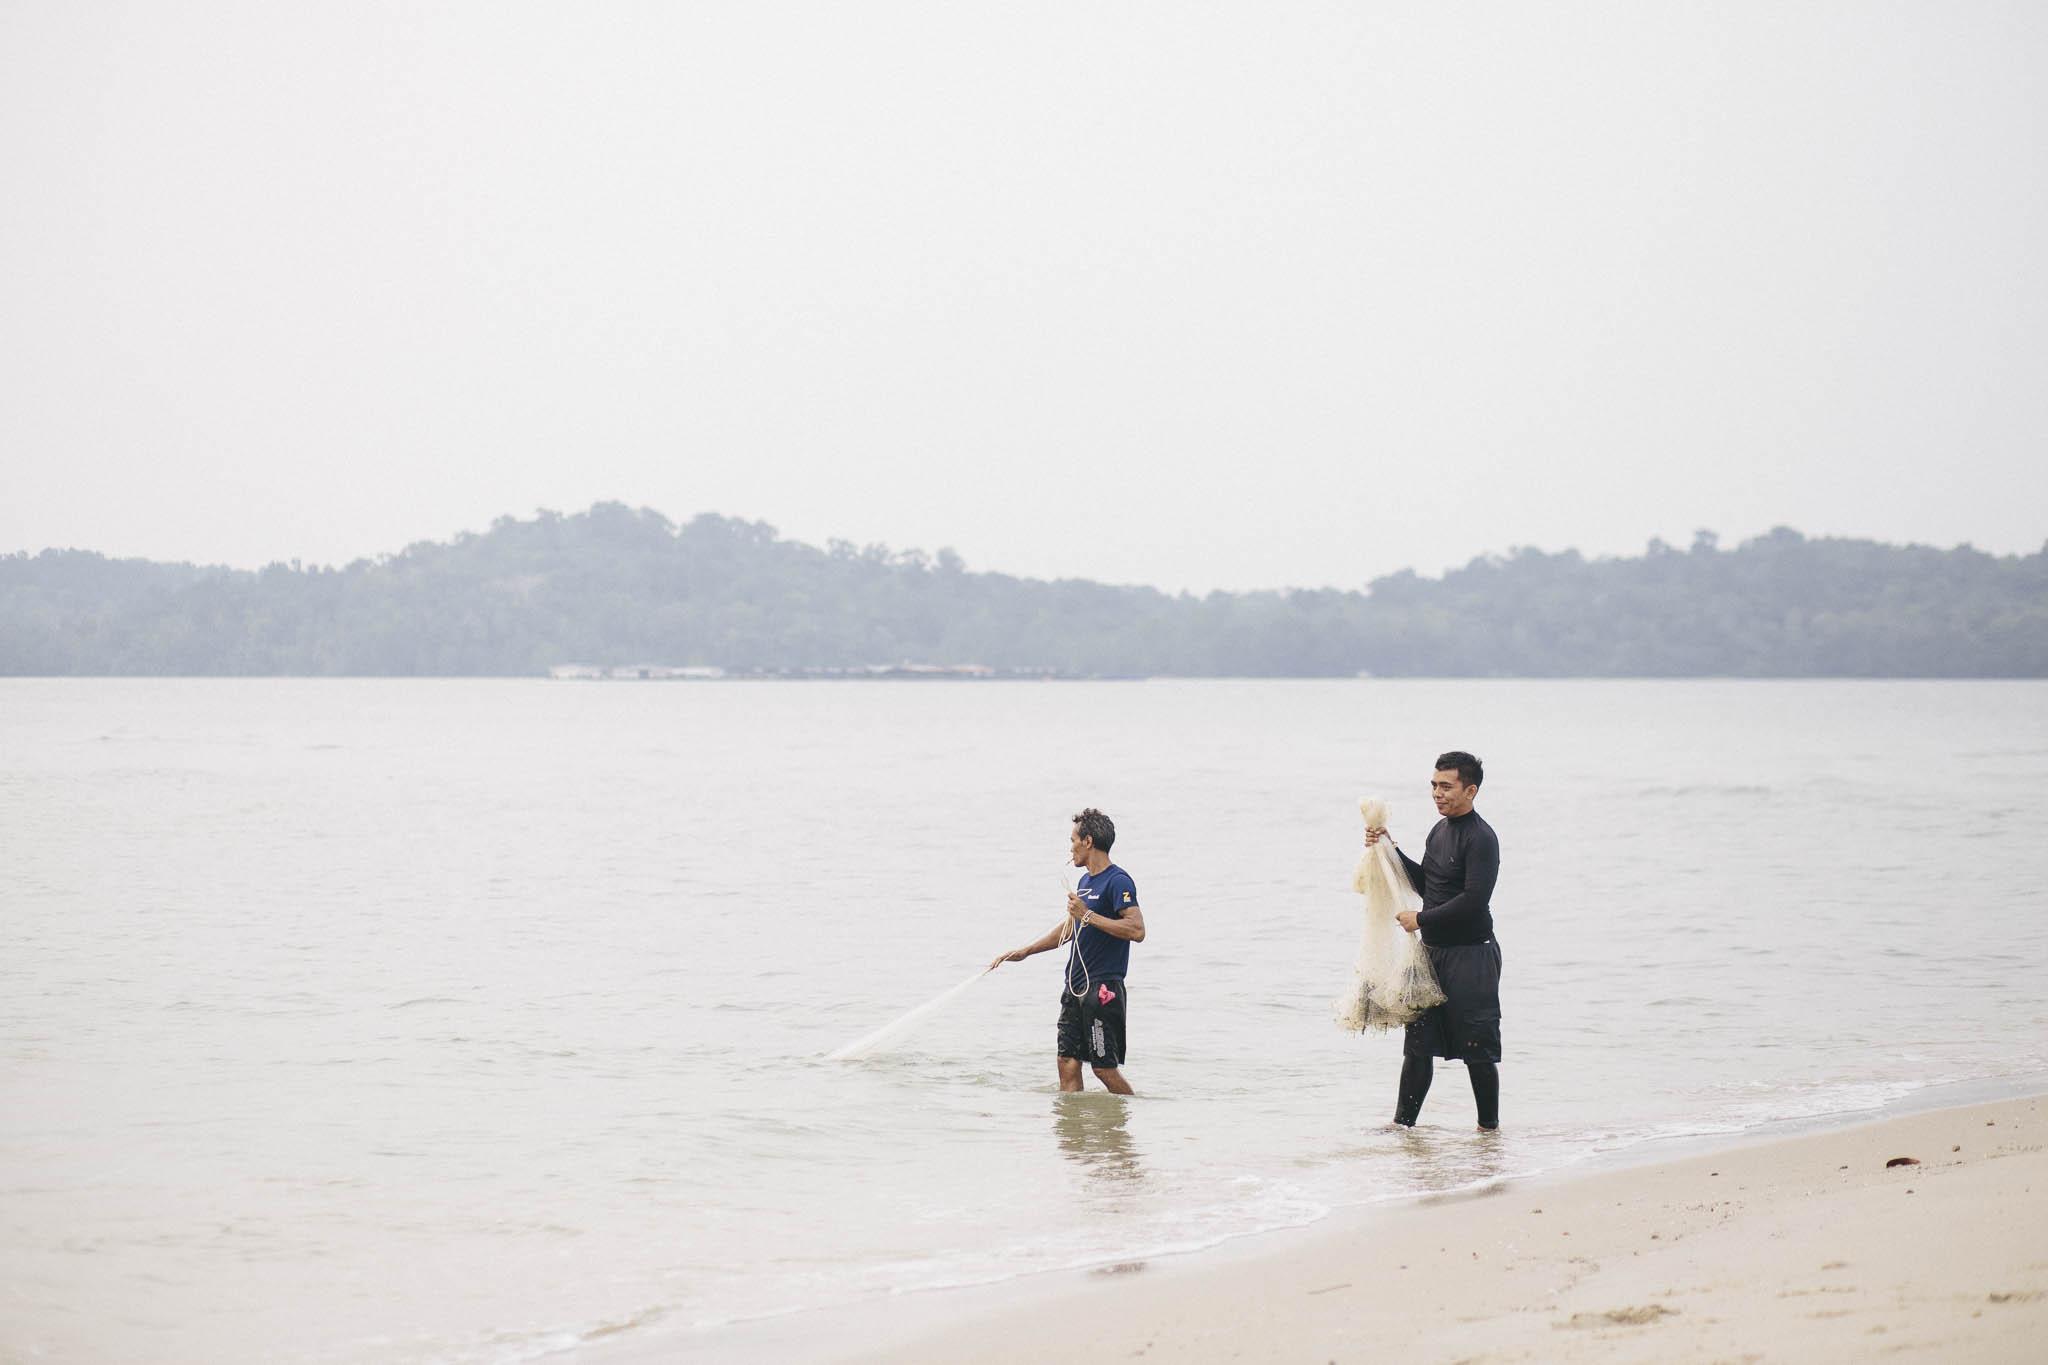 singapore-wedding-photographer-malay-indian-pre-wedding-travel-wmt-2015-04.jpg